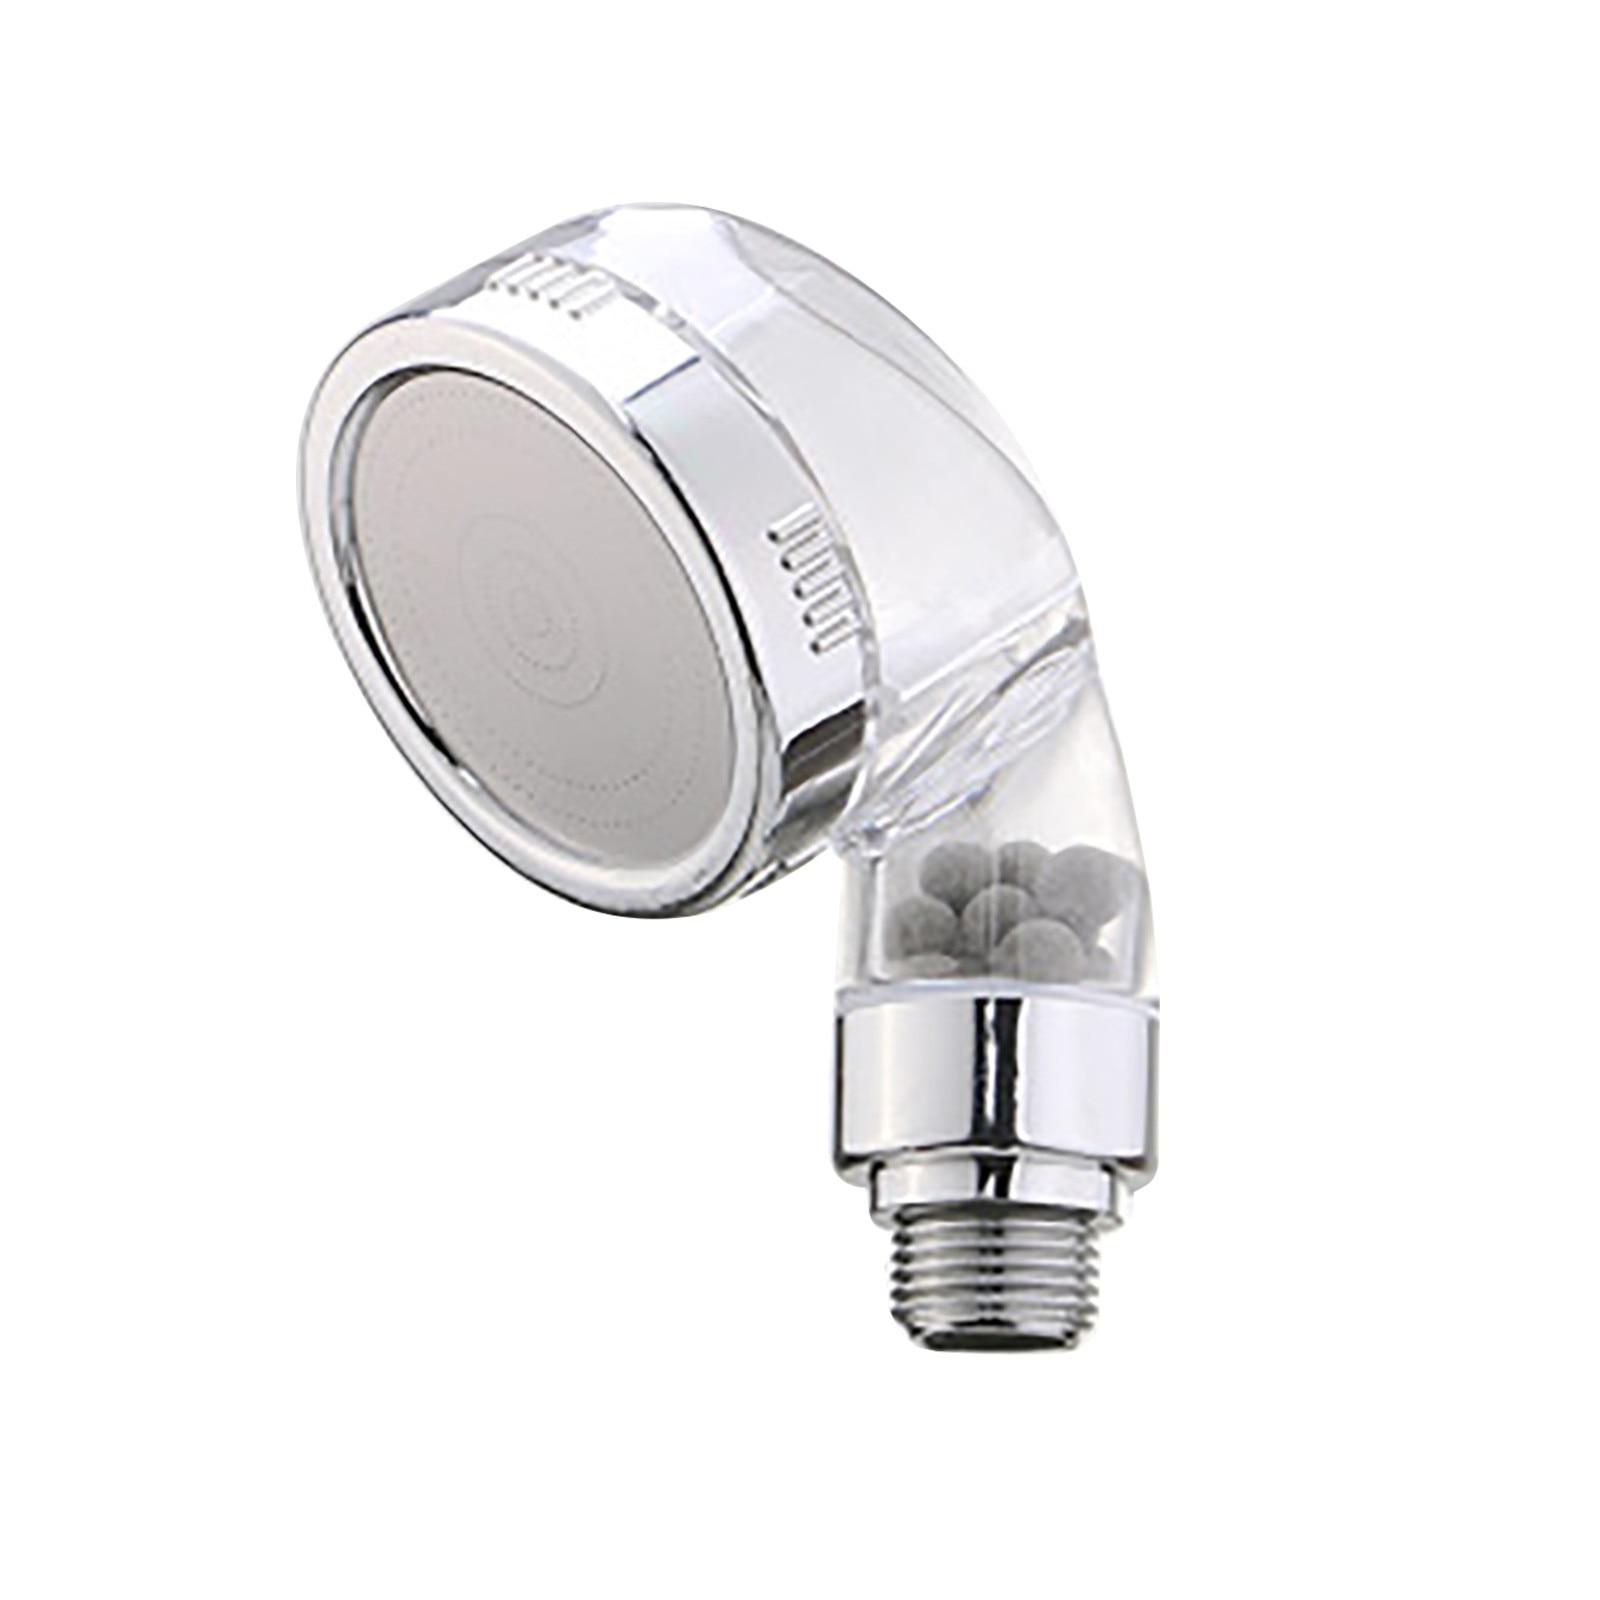 H764134d7ef904e72a87066af4806a0fdM Bathroom Wash Face Basin Water Tap External Shower Head Toilet Hold Filter Flexible Hair Washing Faucet Rinser Extension Set #40